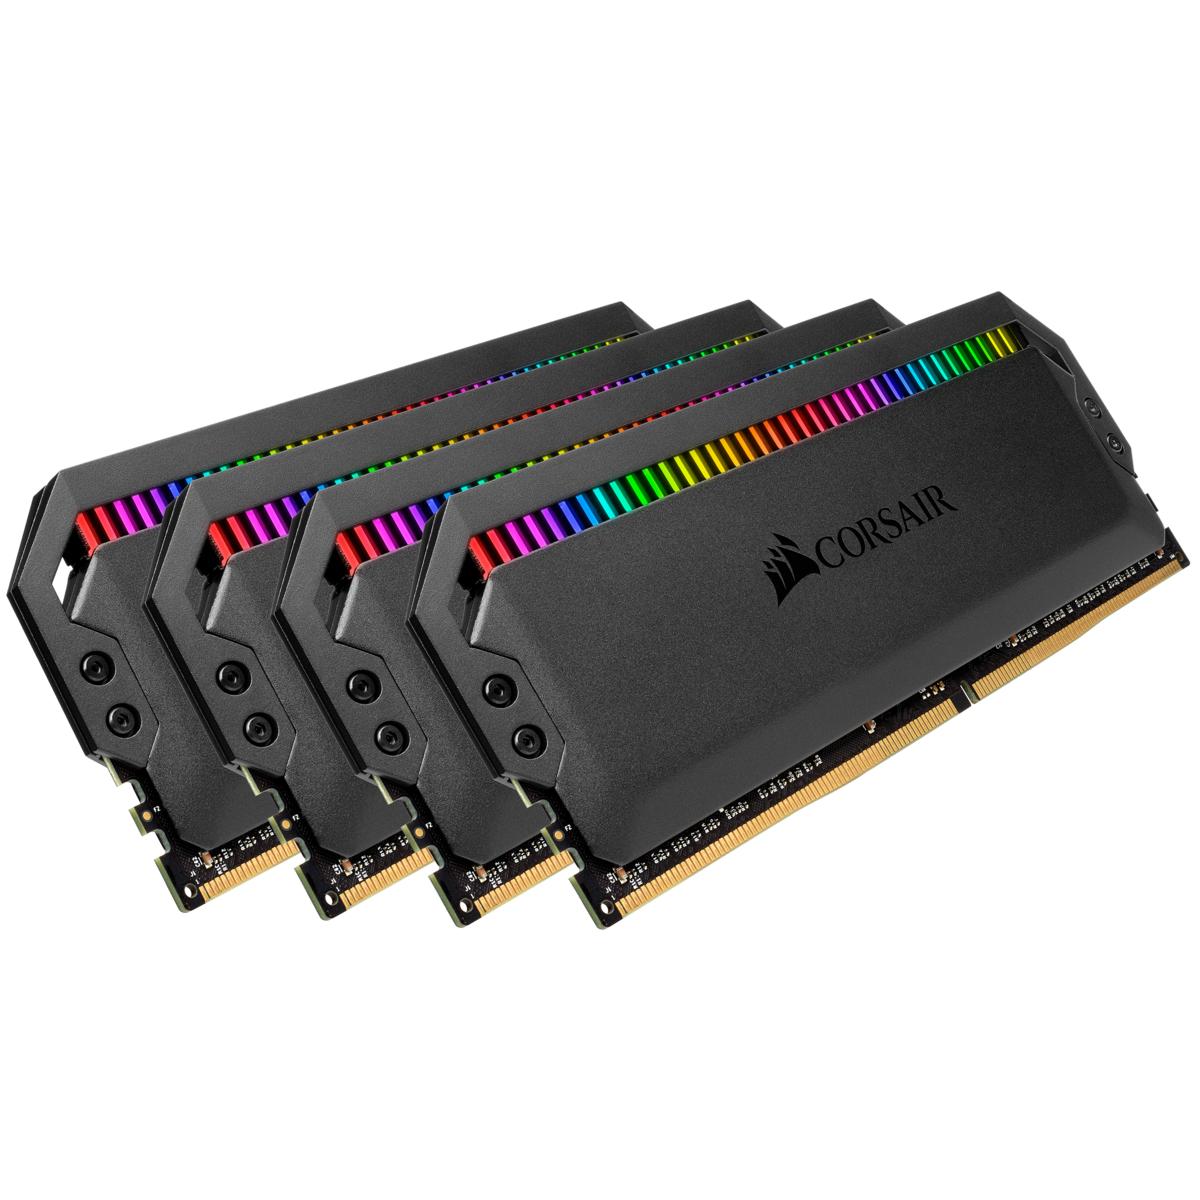 Corsair Dominator Platinum RGB 64 GB 4x16GB DDR4 3466MHz £314.94 @ Corsair shop